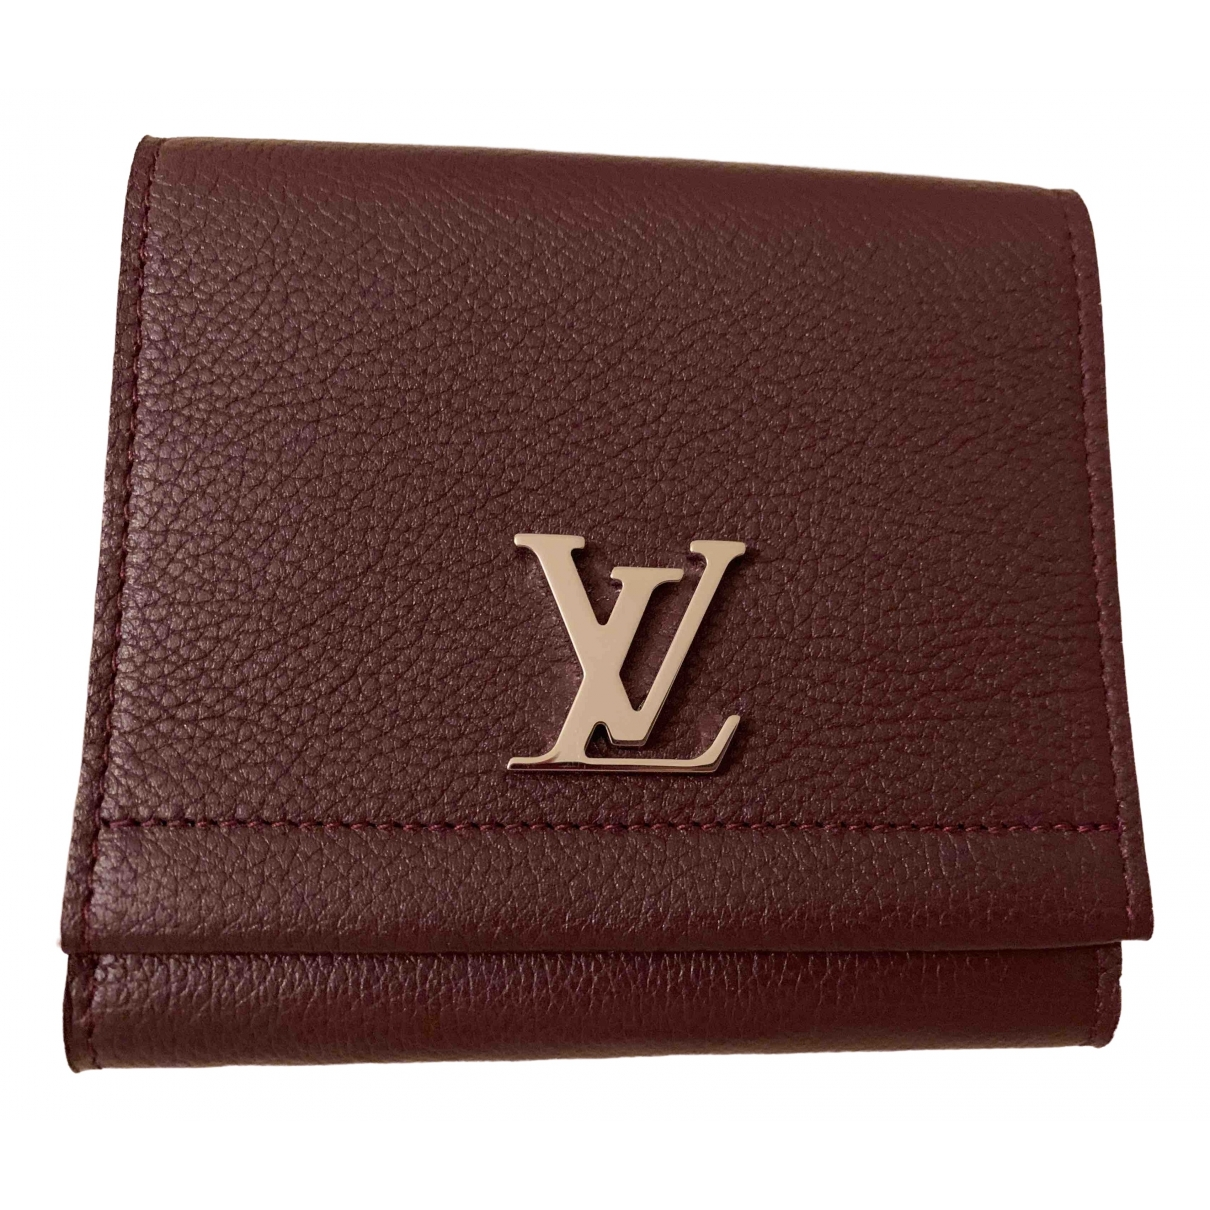 Cartera Lockme de Cuero Louis Vuitton